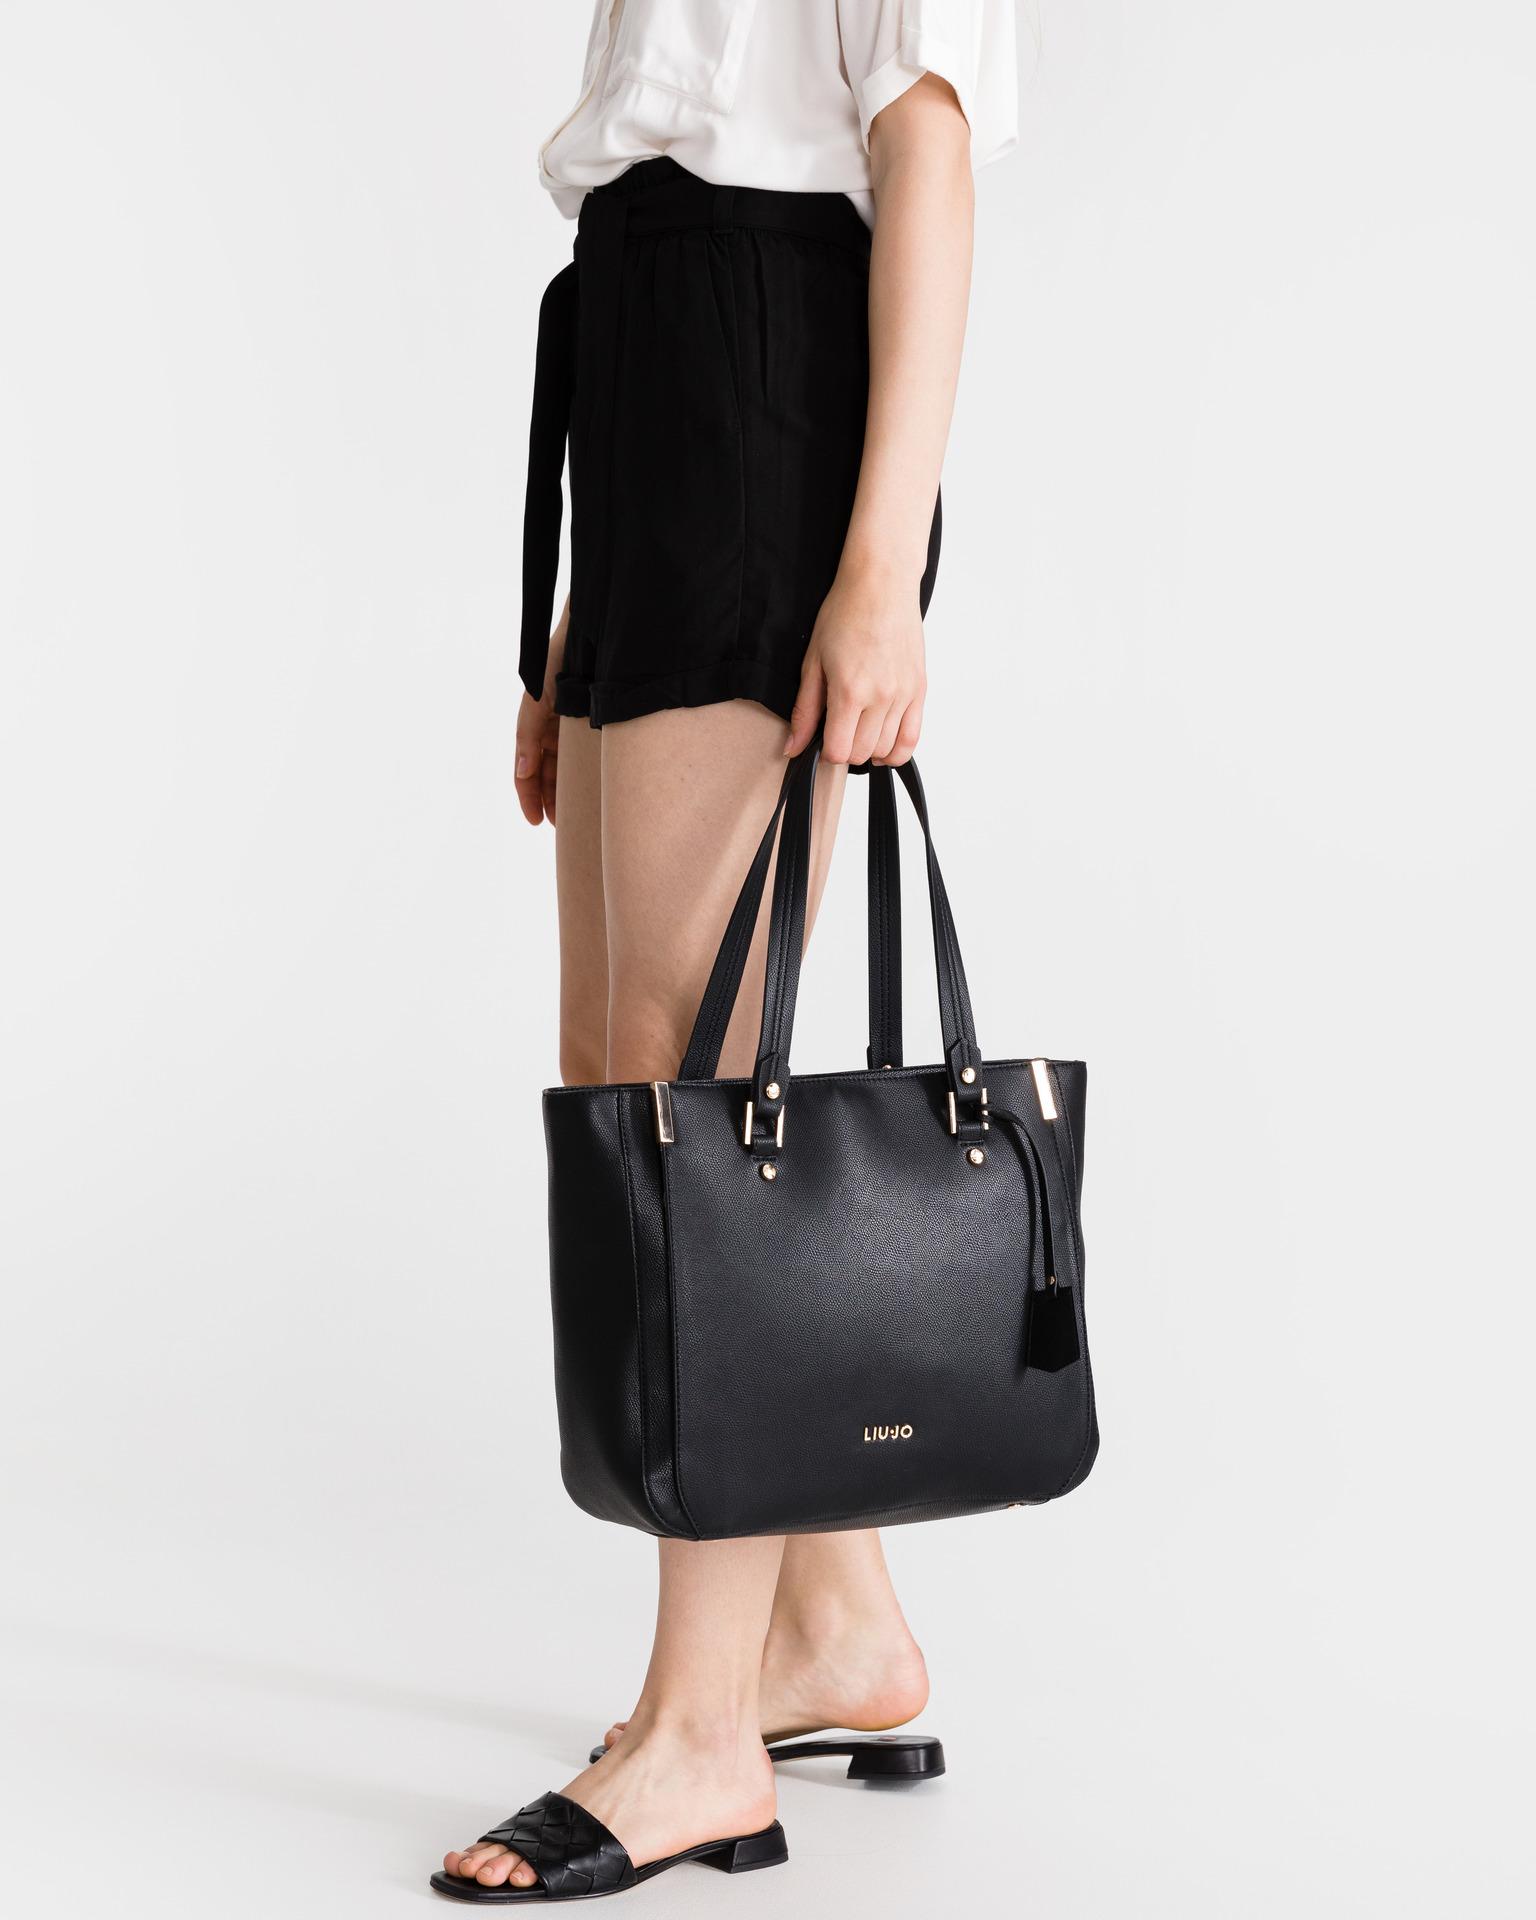 Liu Jo czarny torebka